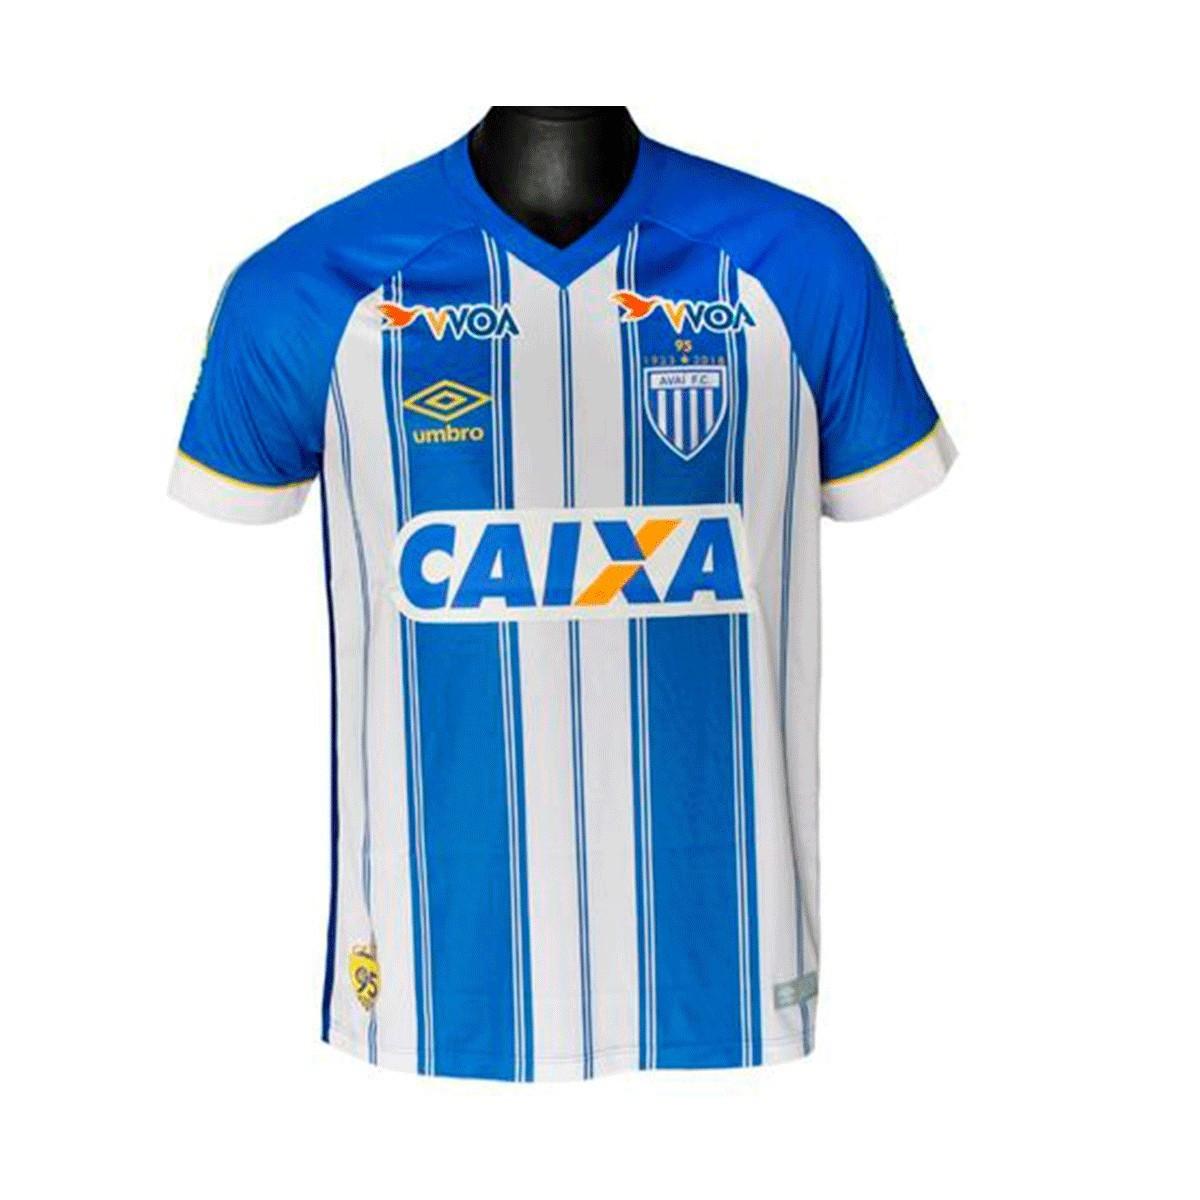 Camisa Avaí Umbro Home Jogador 2018